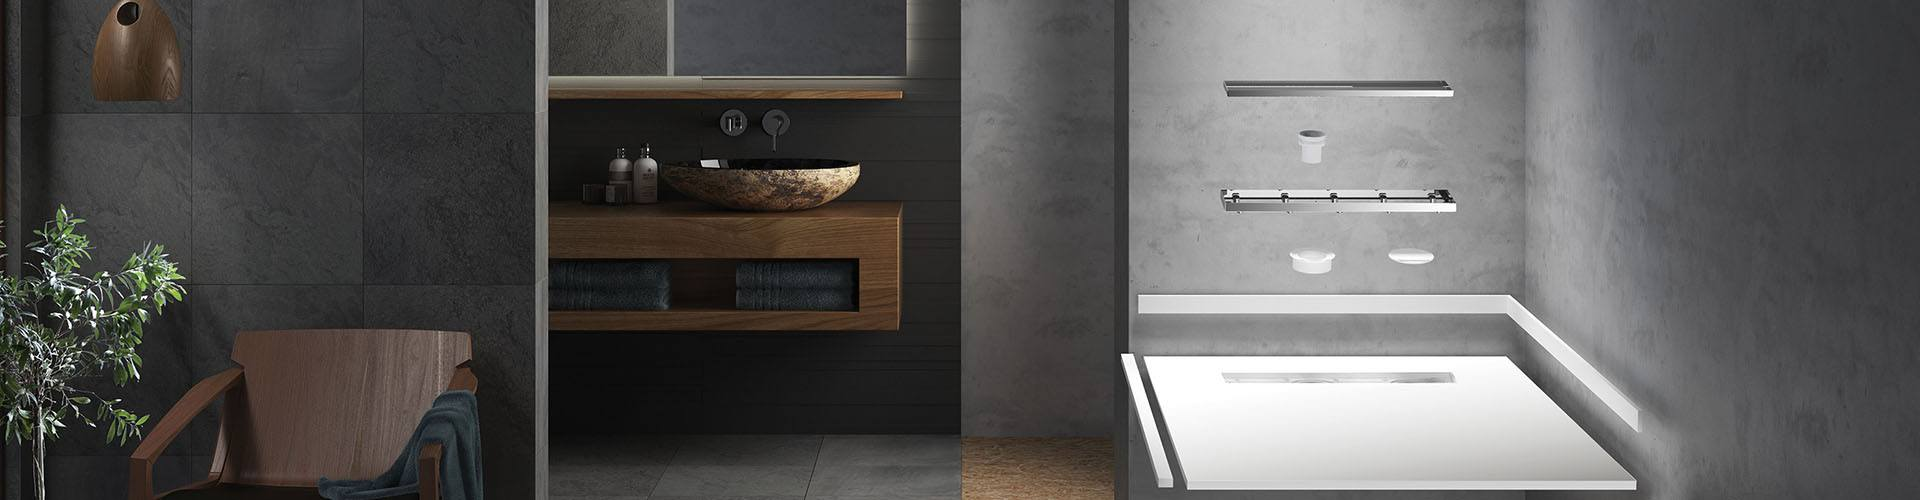 Shower Brands | Hortons Bathrooms Tamworth | Showers In Tamworth